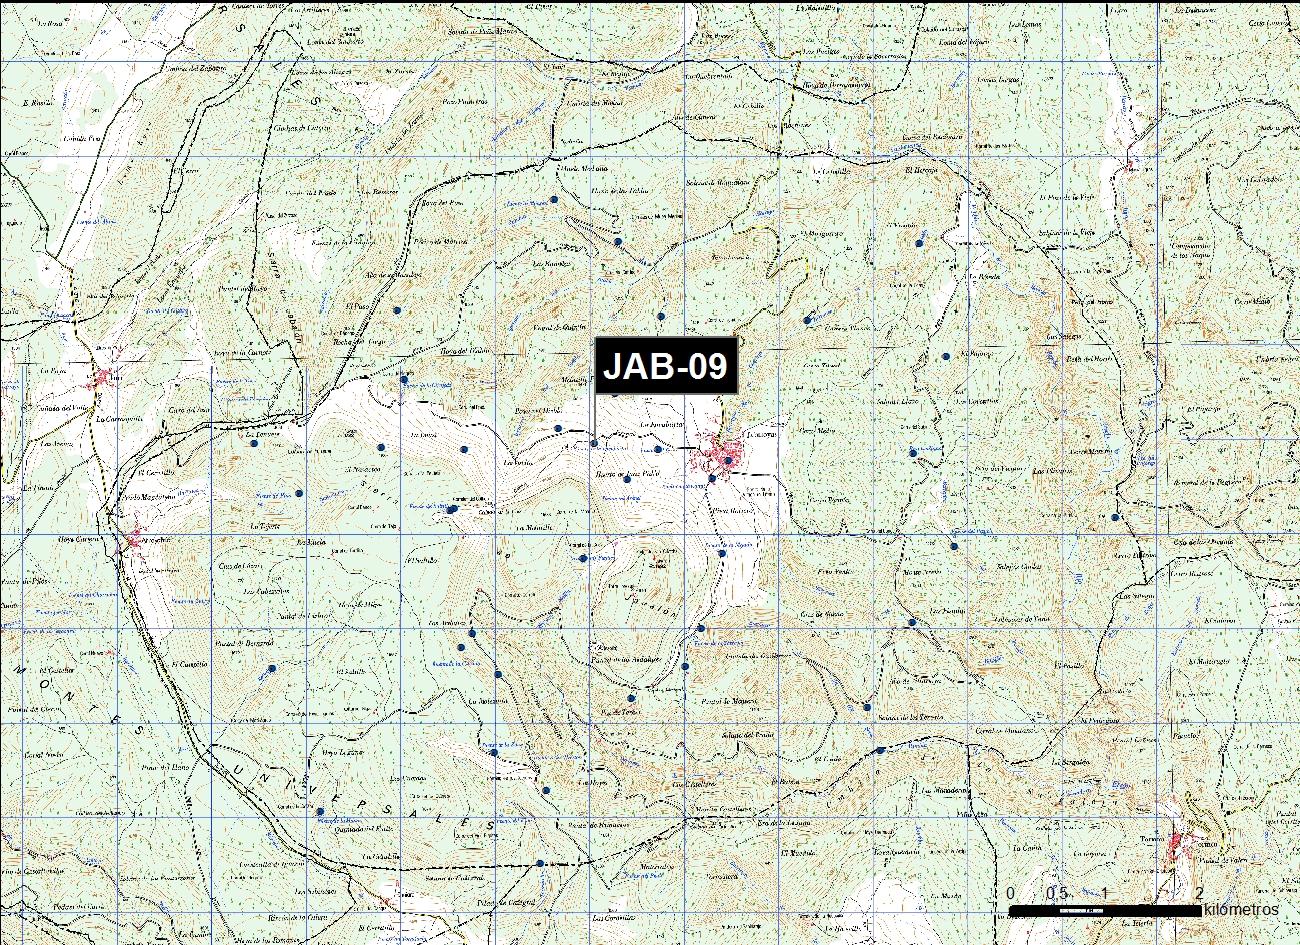 JAB_09_M.V.LOZANO_ENCUBIERTA_MAP.TOPO 1